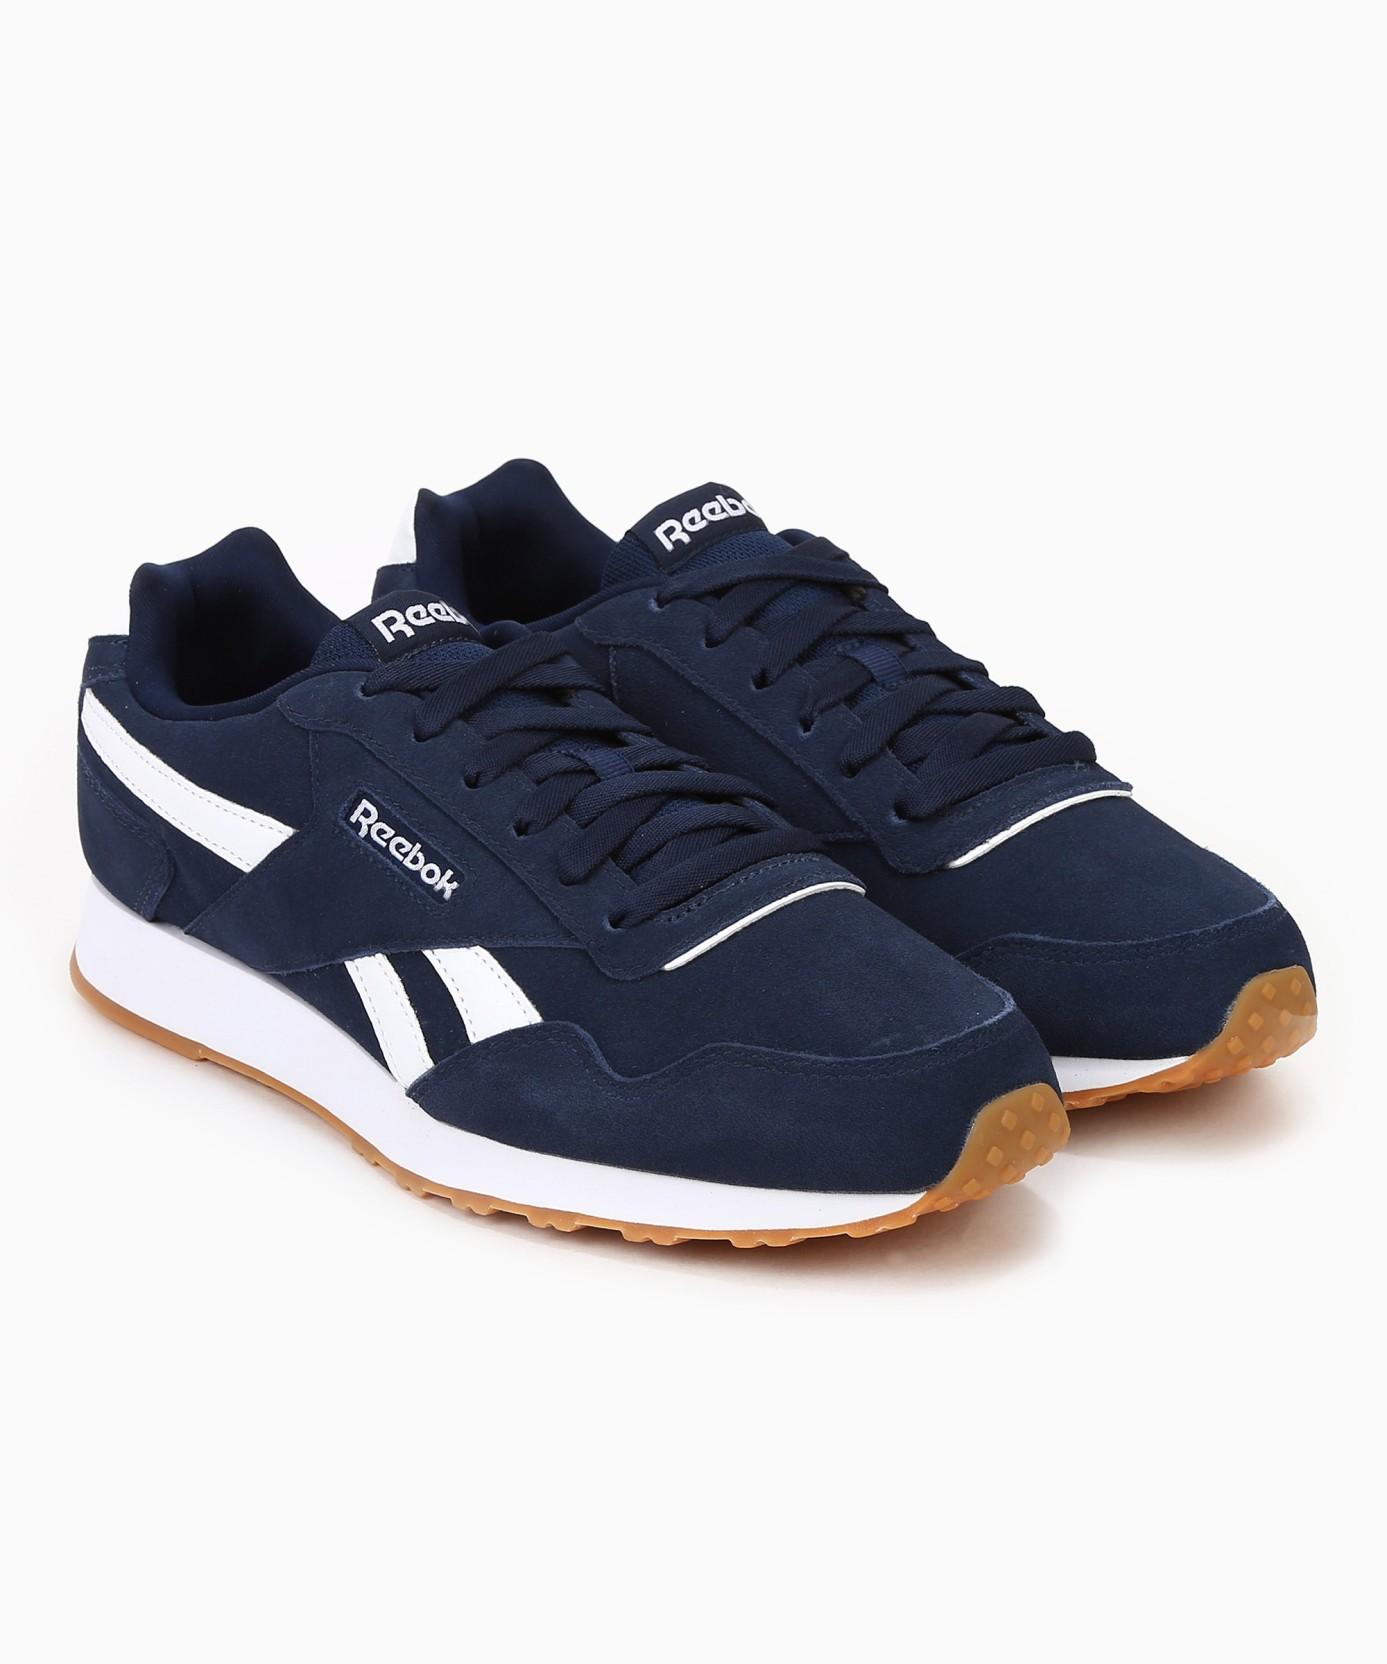 REEBOK CLASSICS REEBOK ROYAL GLIDE LX Running Shoes For Men